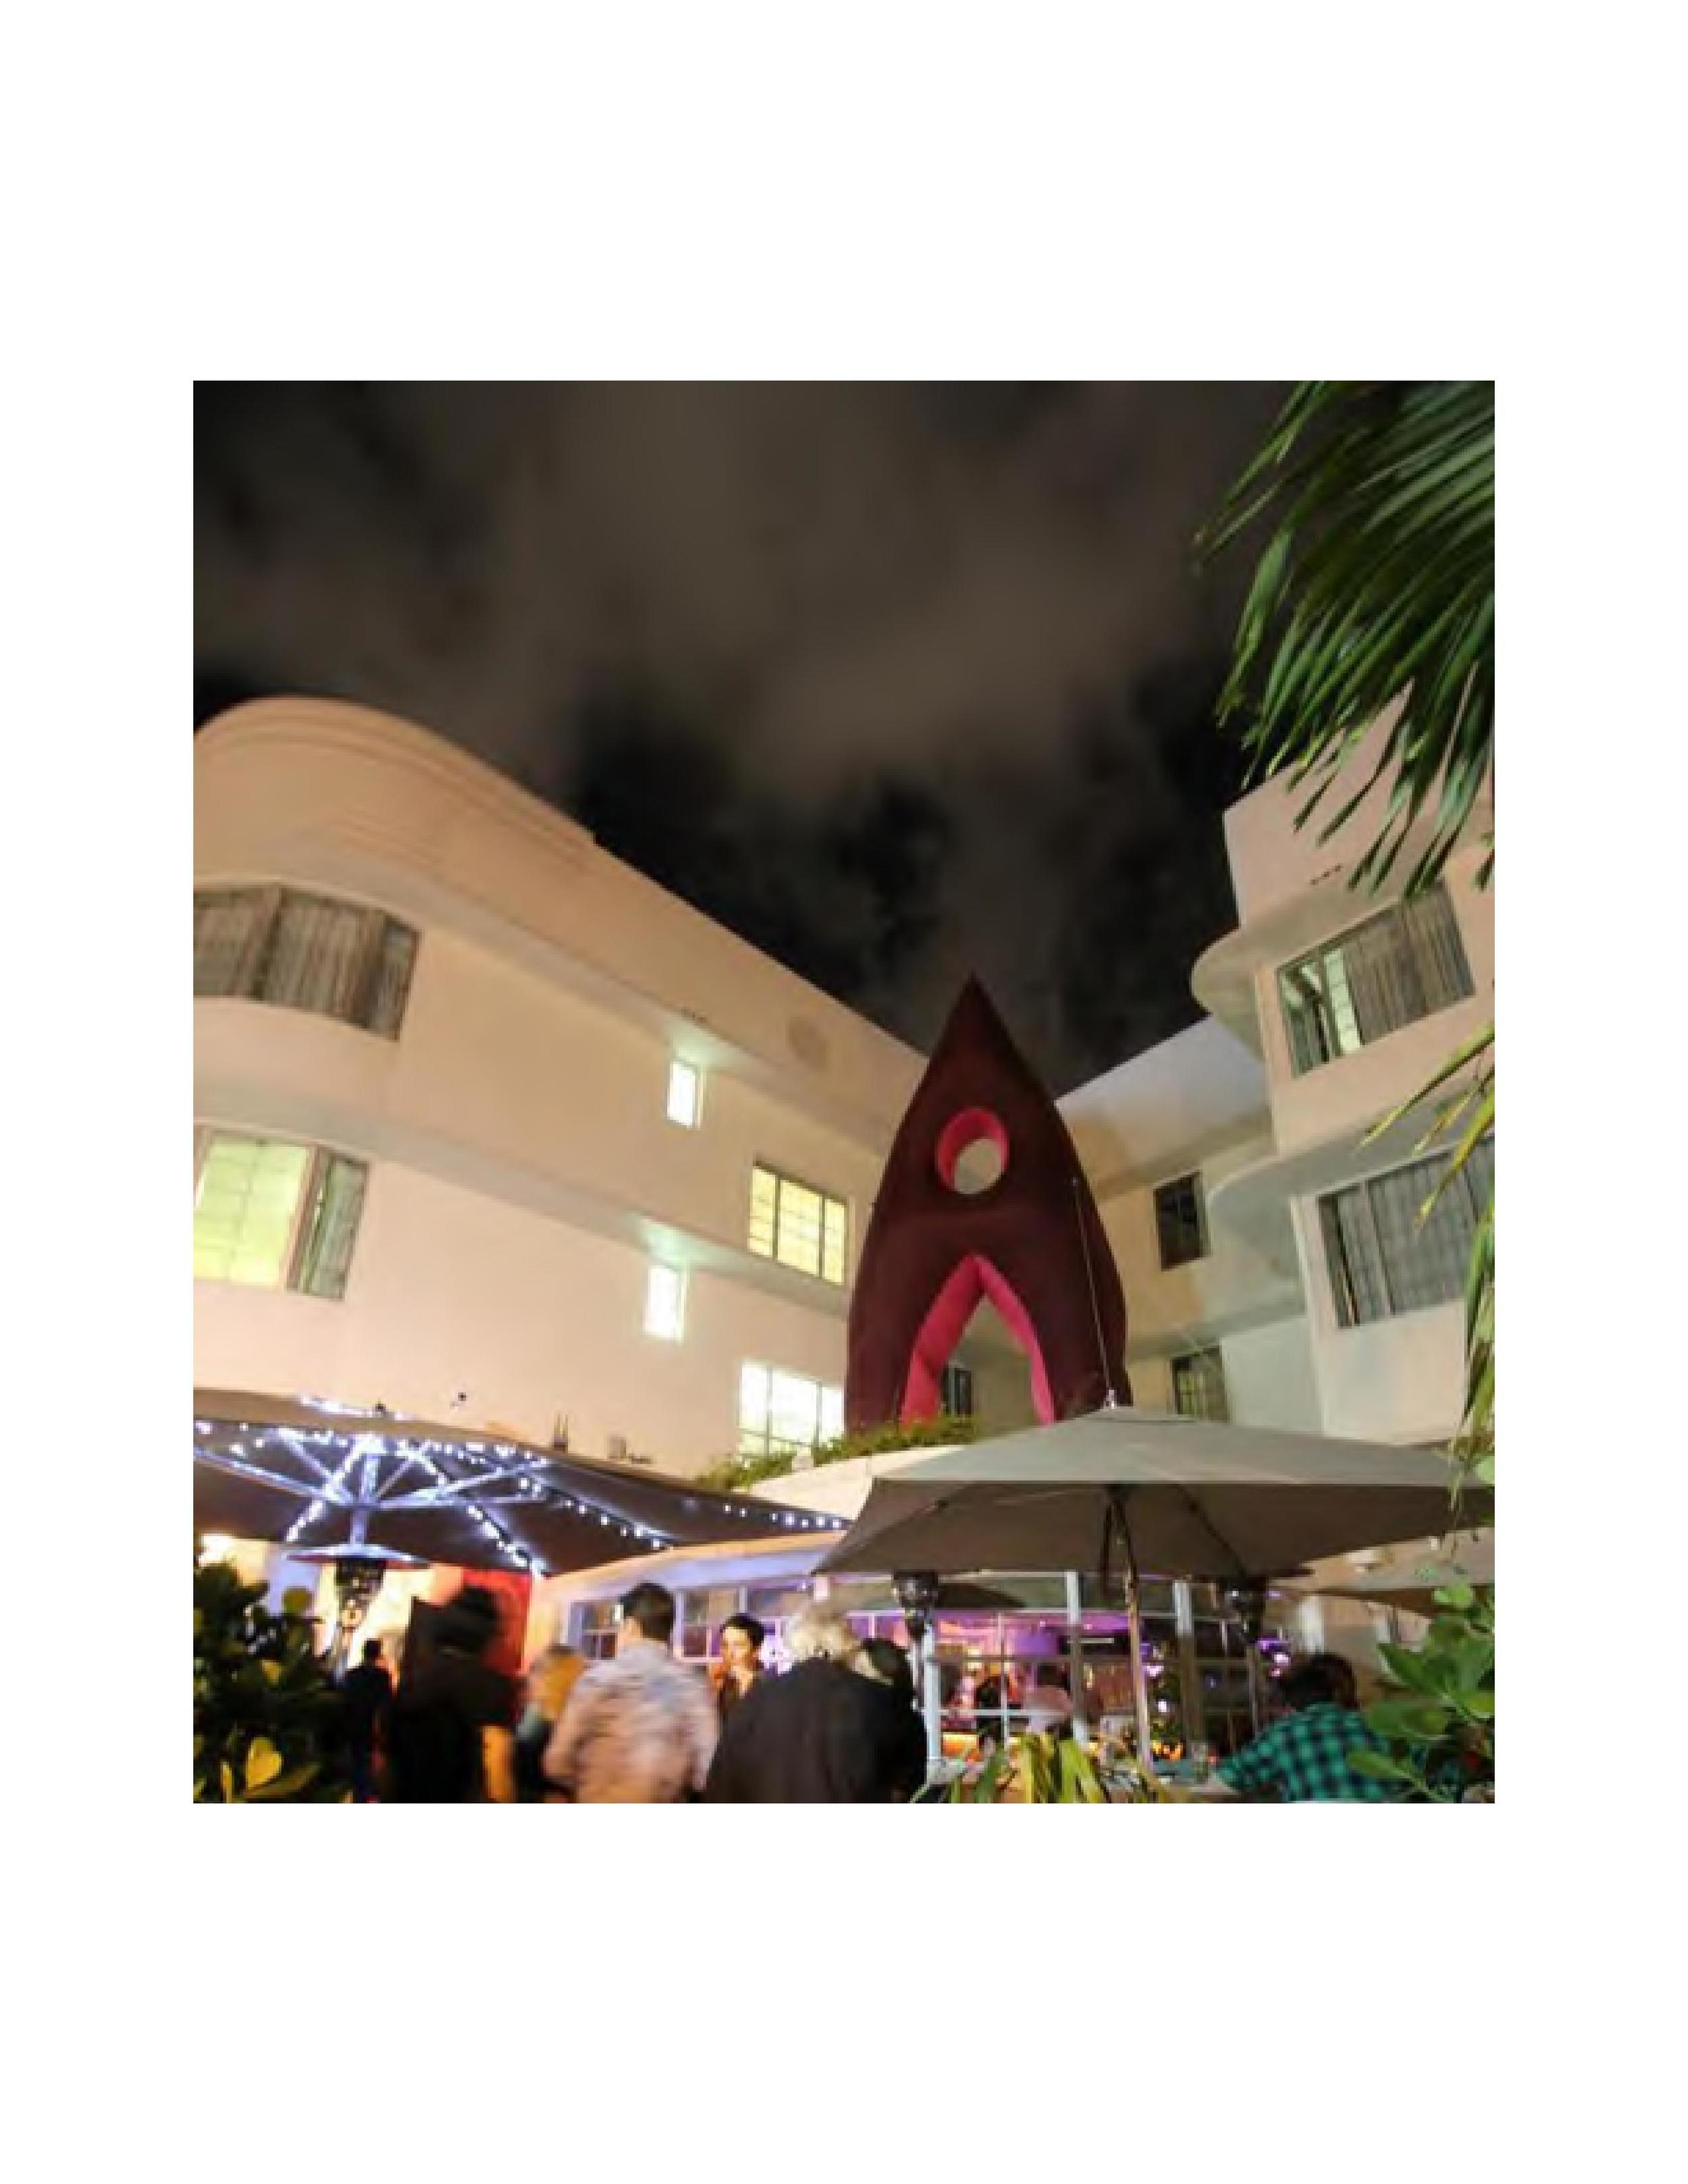 Miami_Art_Basel_Photographs-web-page-087.jpg